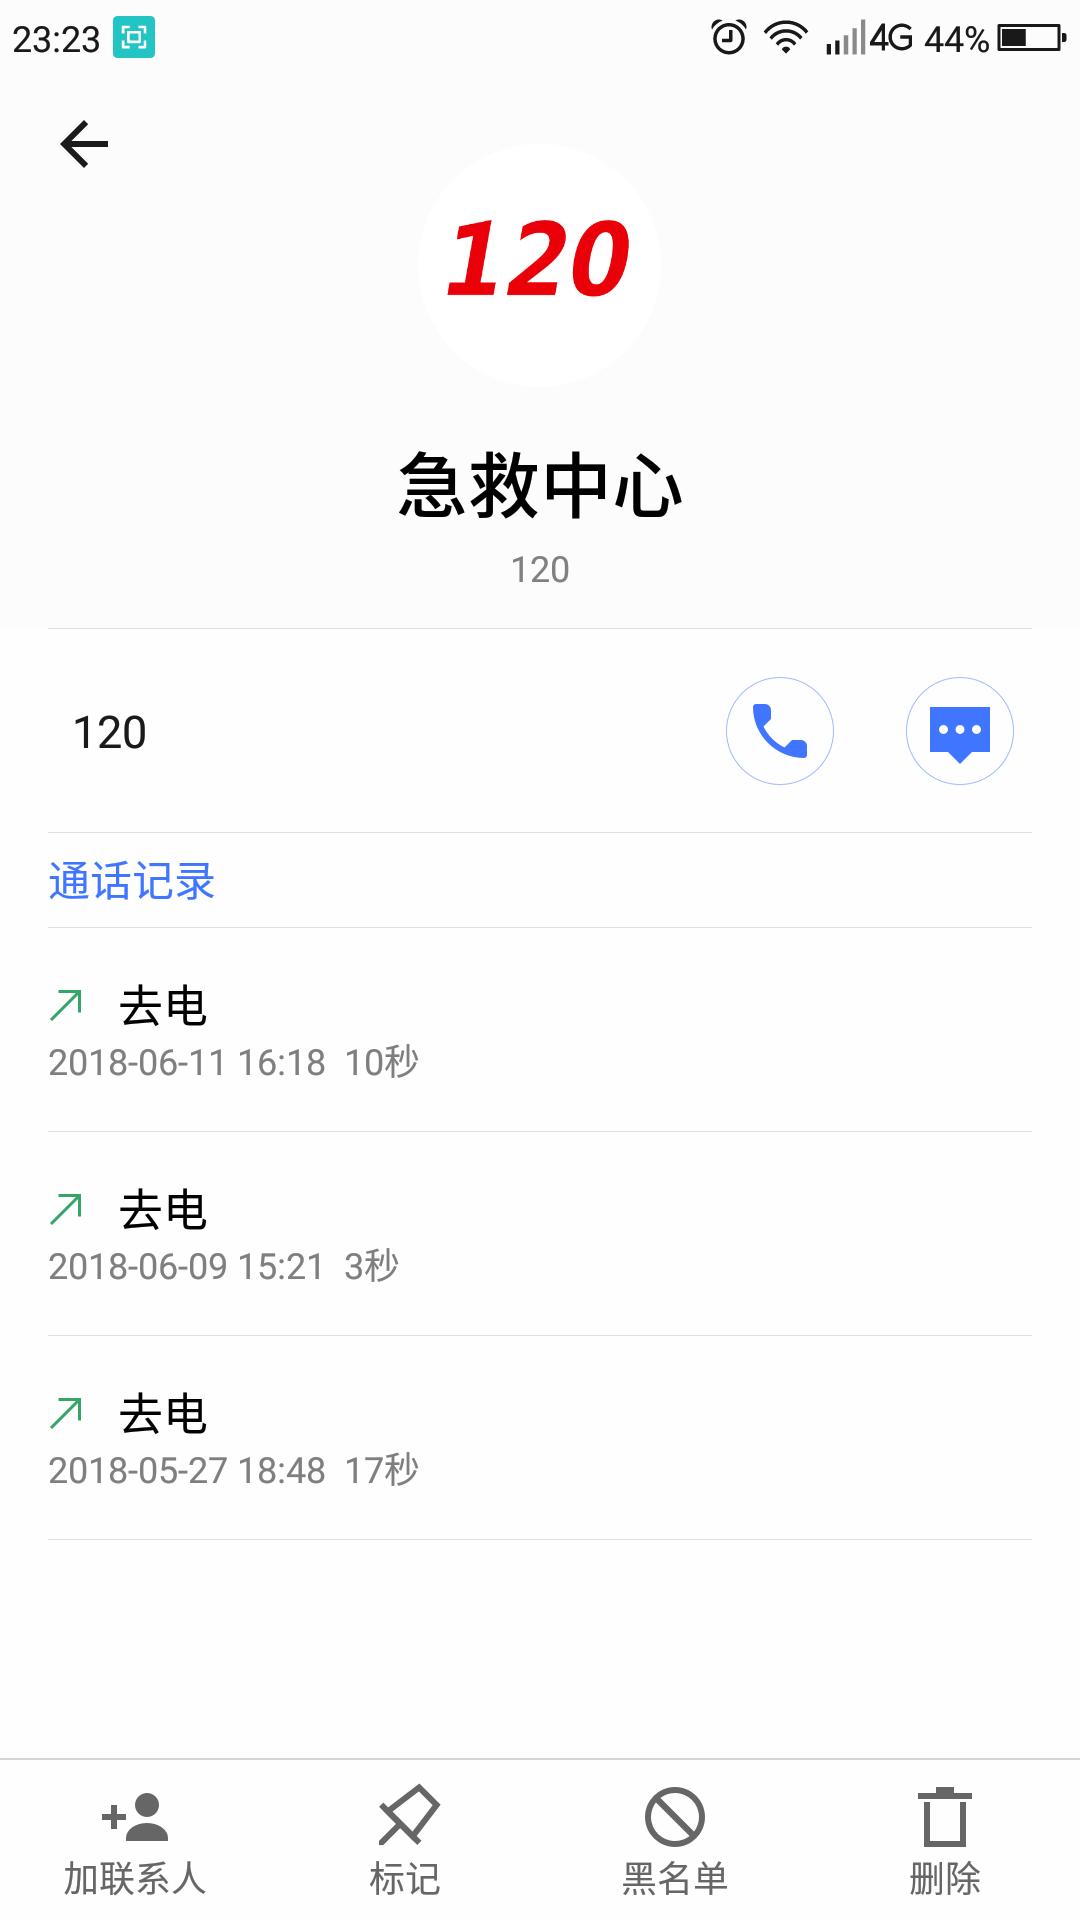 Screenshot_2018-06-16-23-23-37.png